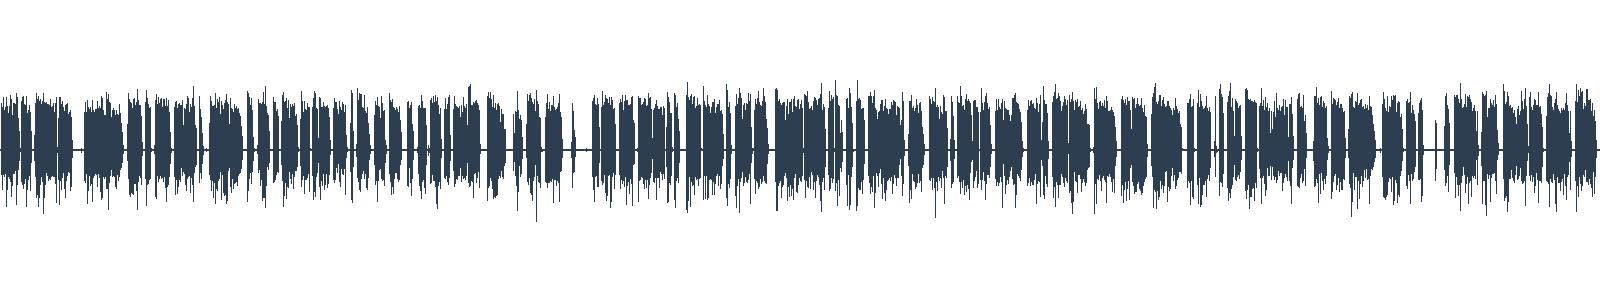 Adam Szustak: Hrniec strachu (2) waveform